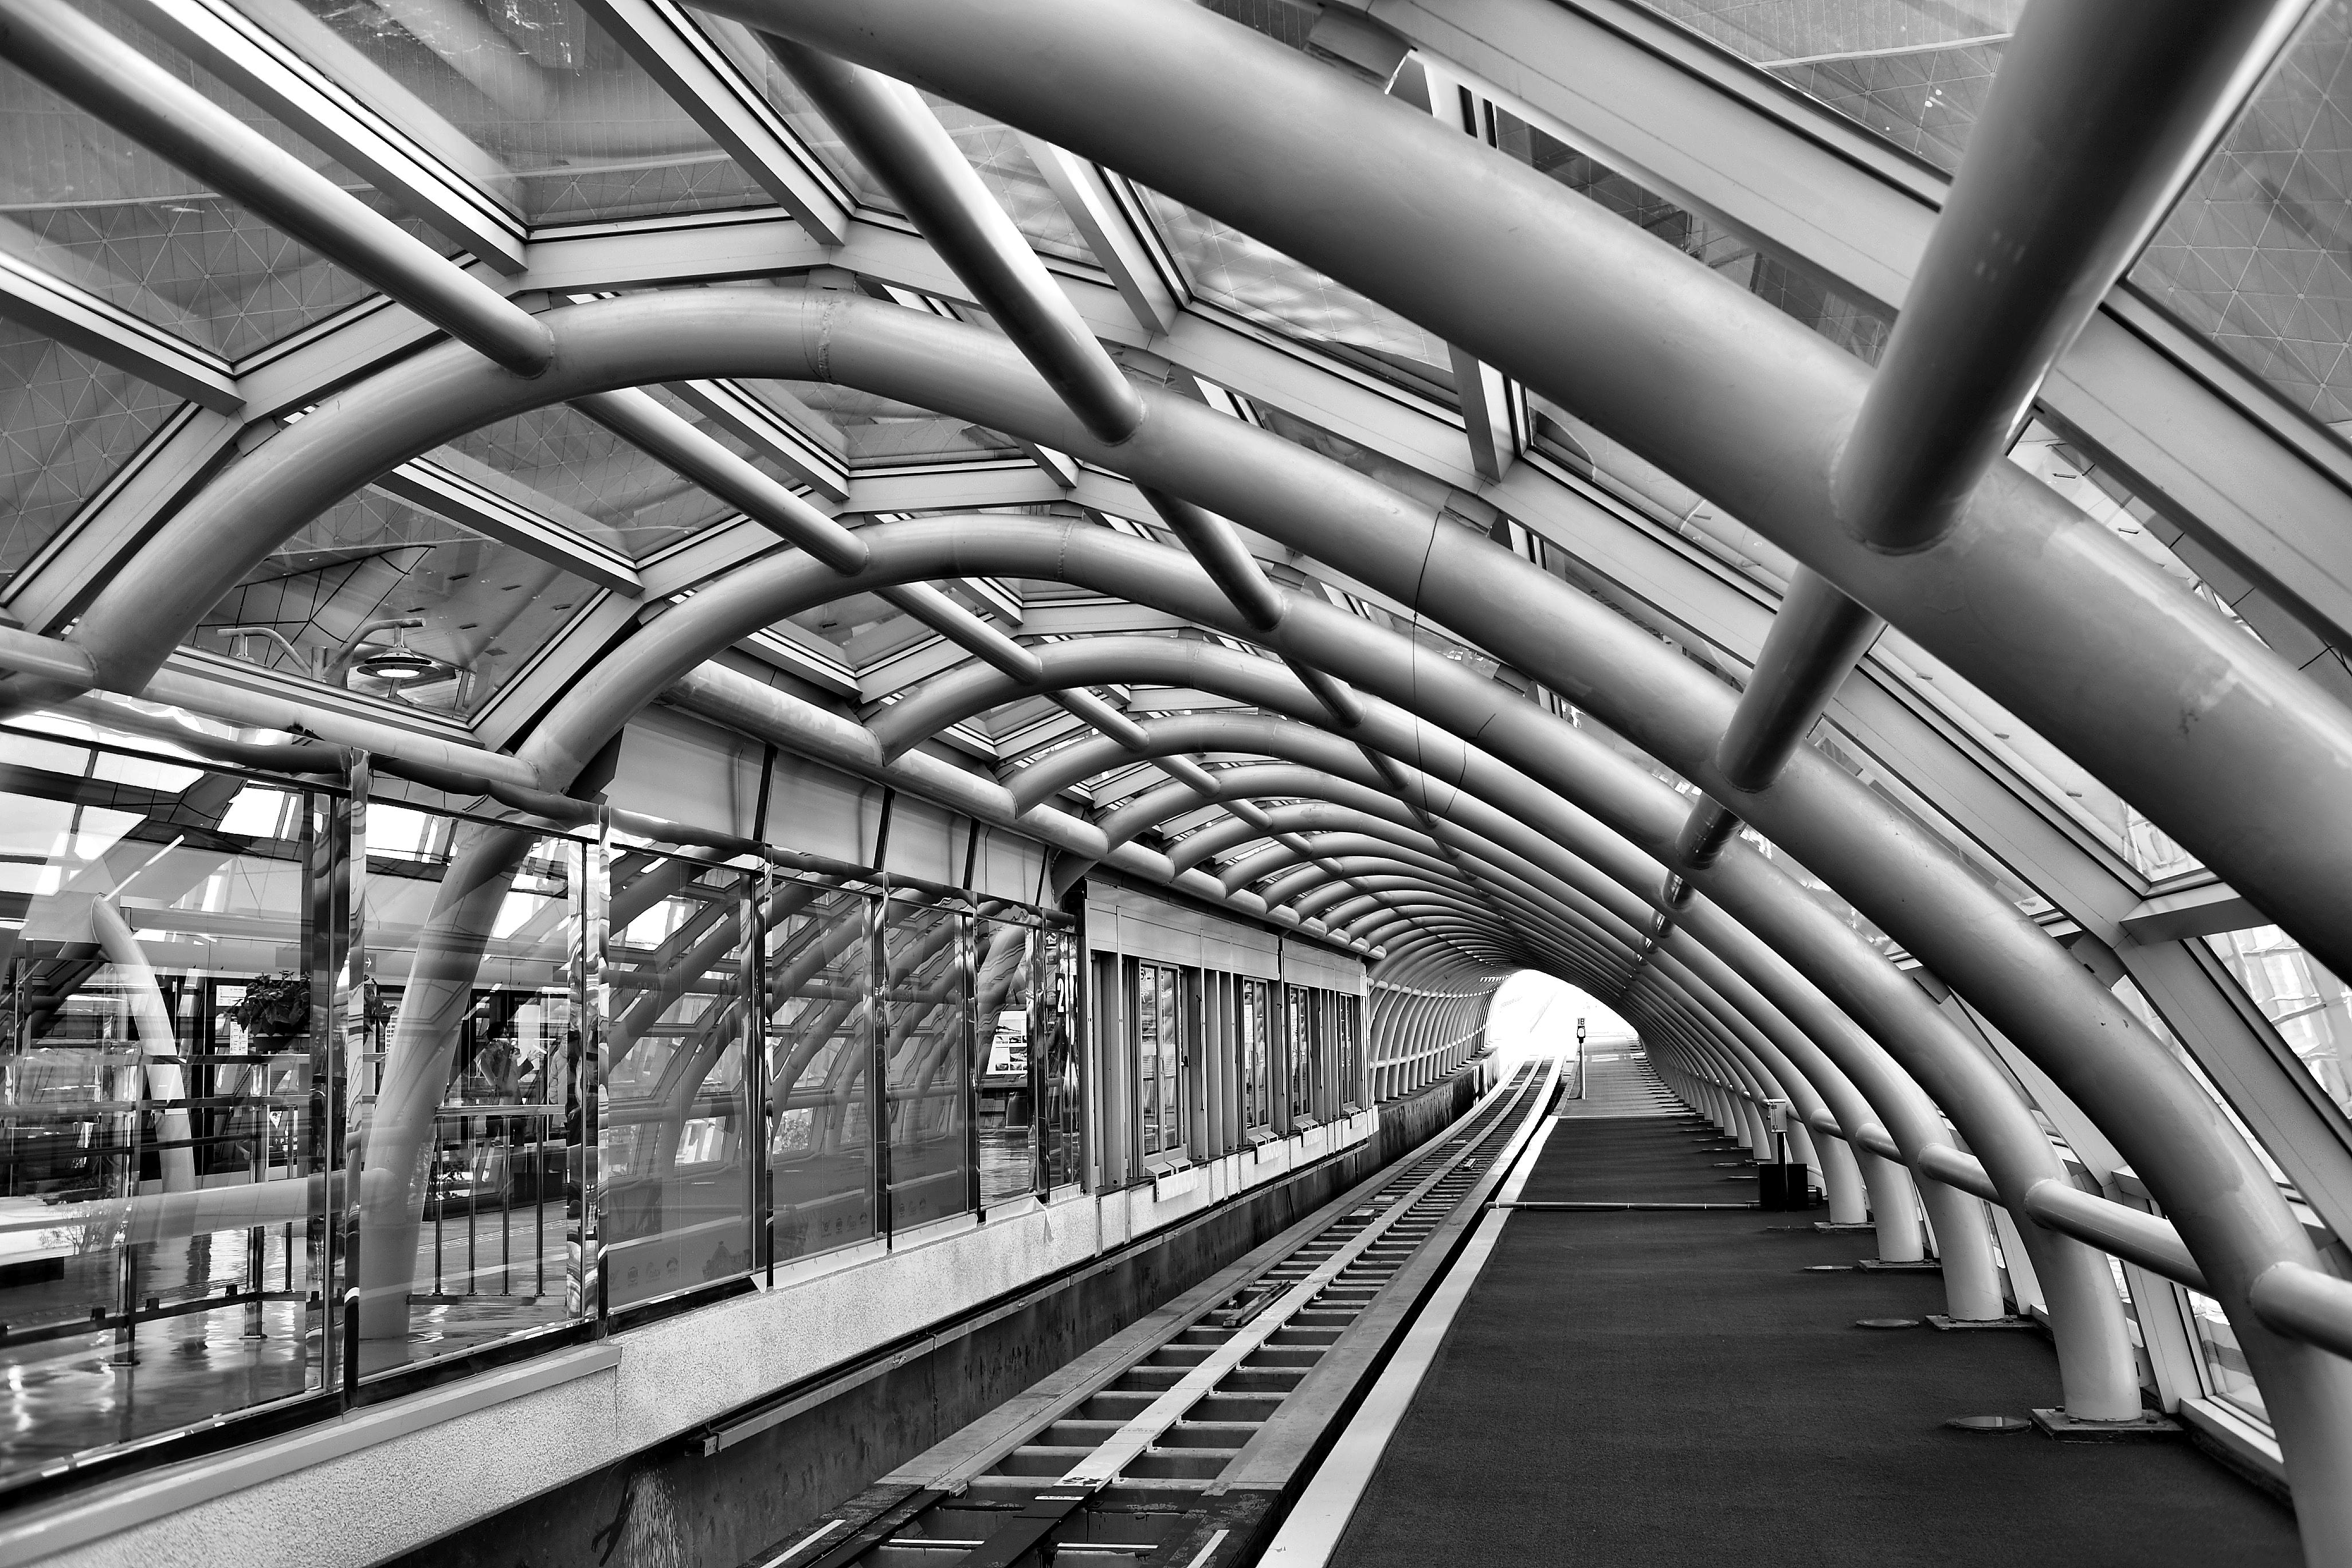 Fotos gratis en blanco y negro arquitectura pista for Arquitectura en linea gratis